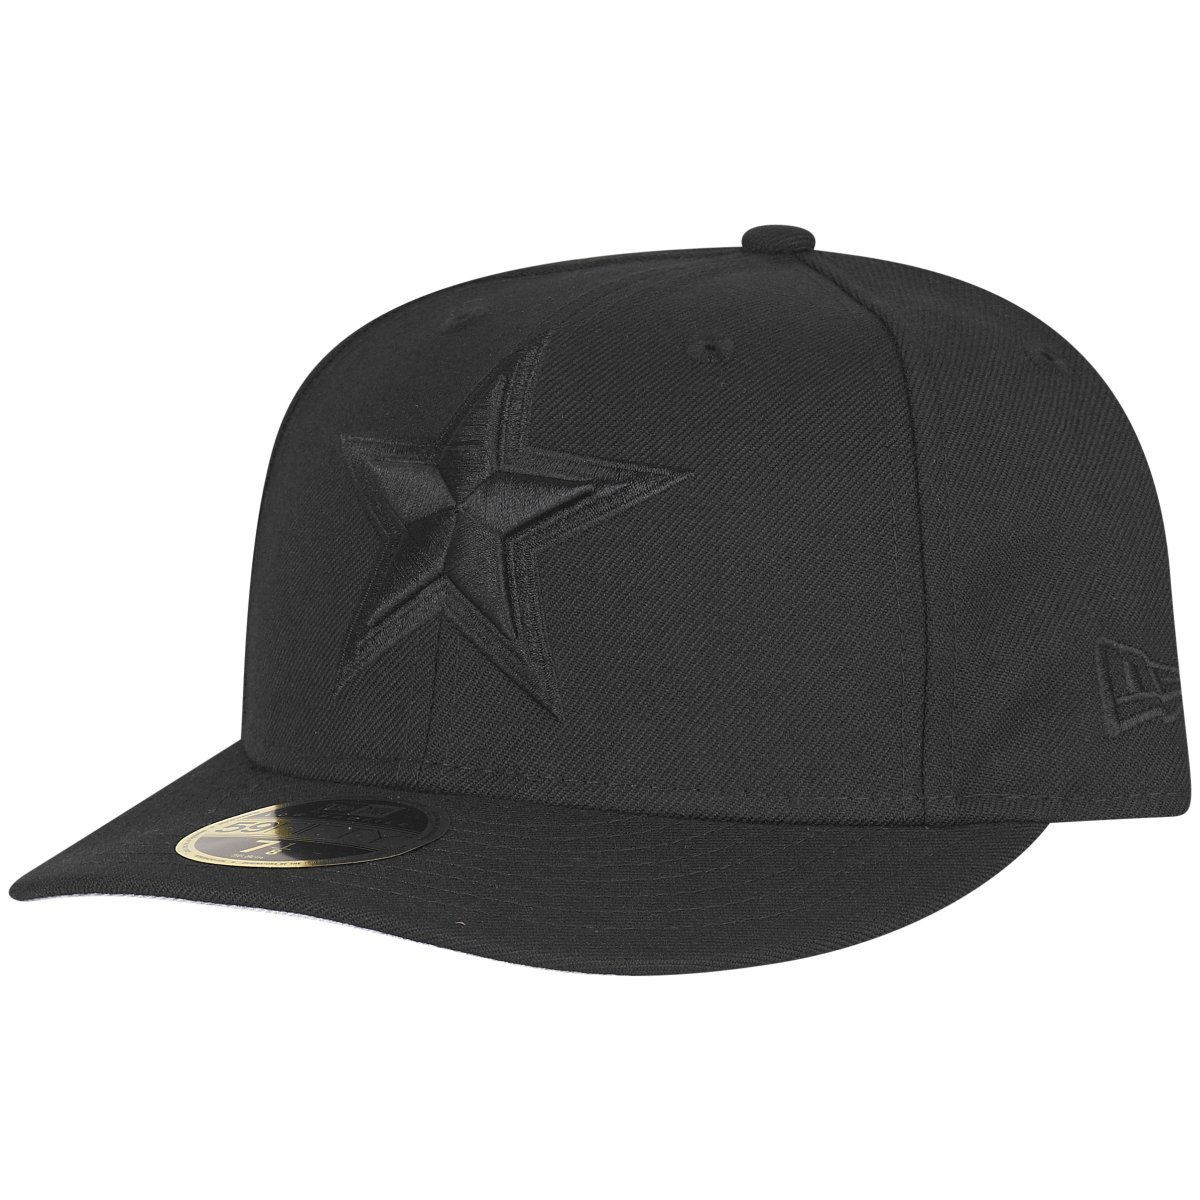 Dallas Cowboys Noir New Era 59Fifty Low Profile Cap